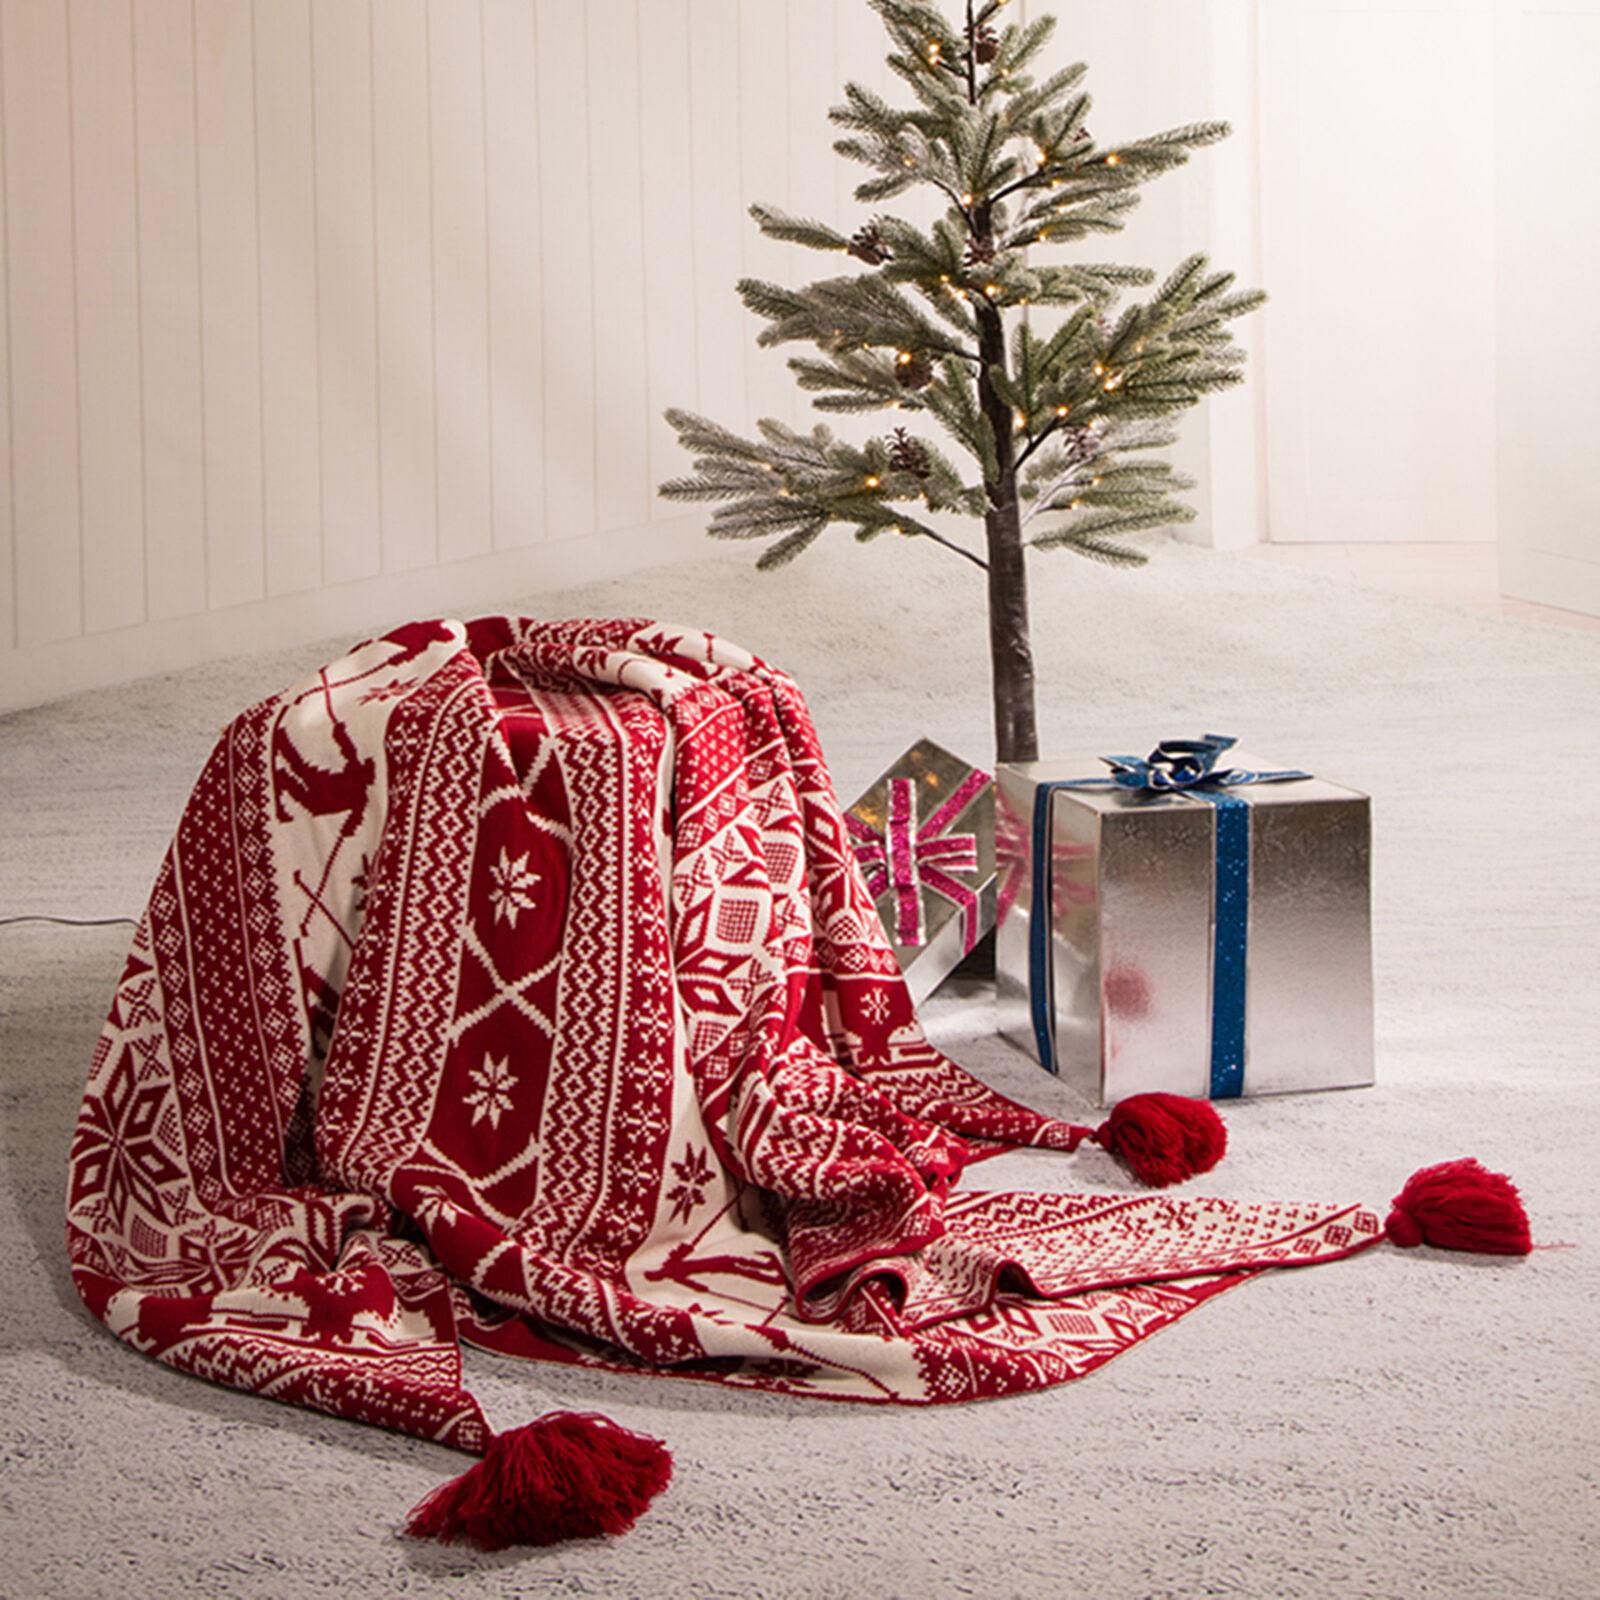 Christmas Throw Blanket.Glitzhome Soft Warm Knit Throw Blanket Sofa Cover Decor W Tassels Christmas Gift